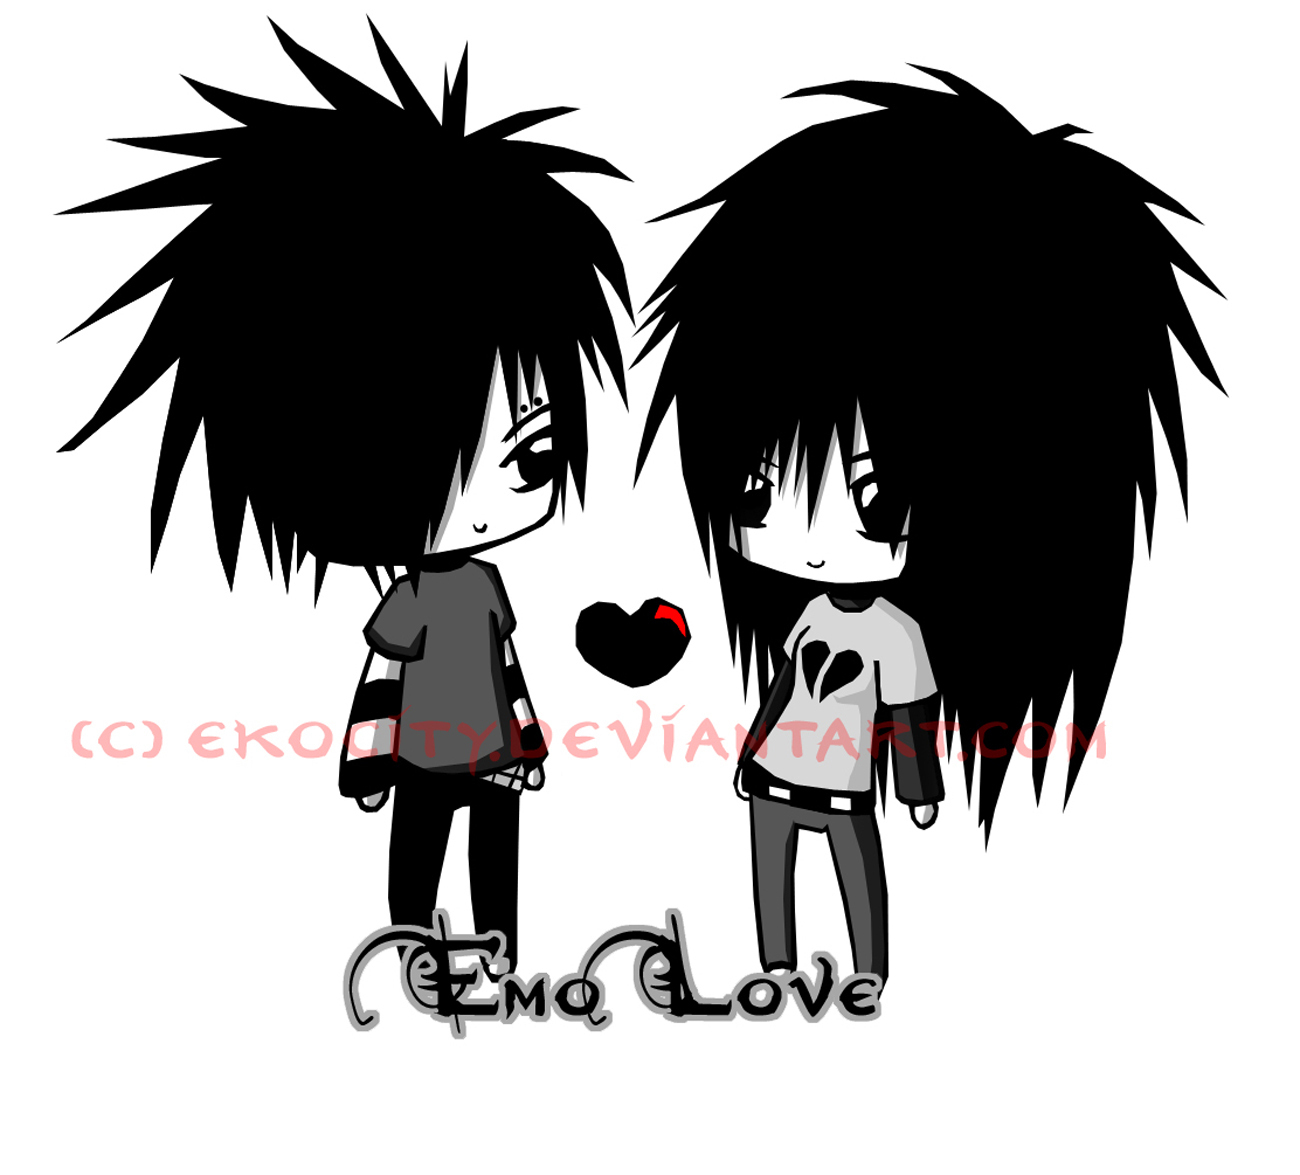 emo love emo photo 8825329 fanpop